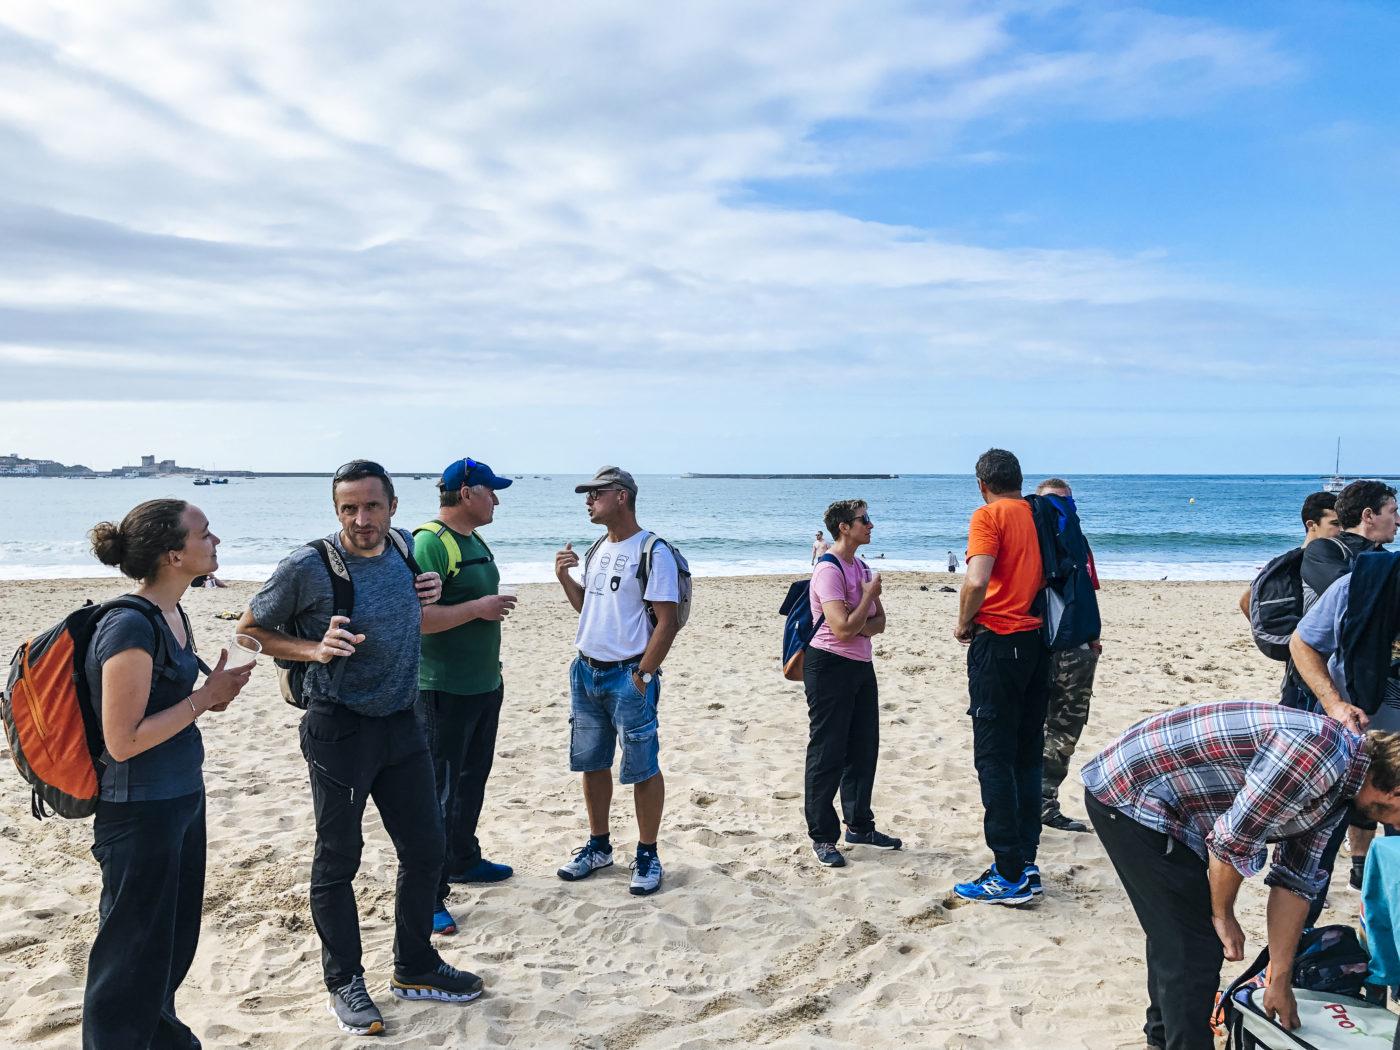 agence evenementielle receptive pays Basque erronda seminaire team building incentive event saint jean de luz ascai sare rhune raid randonnee mer montagne canoe quad treck picnic